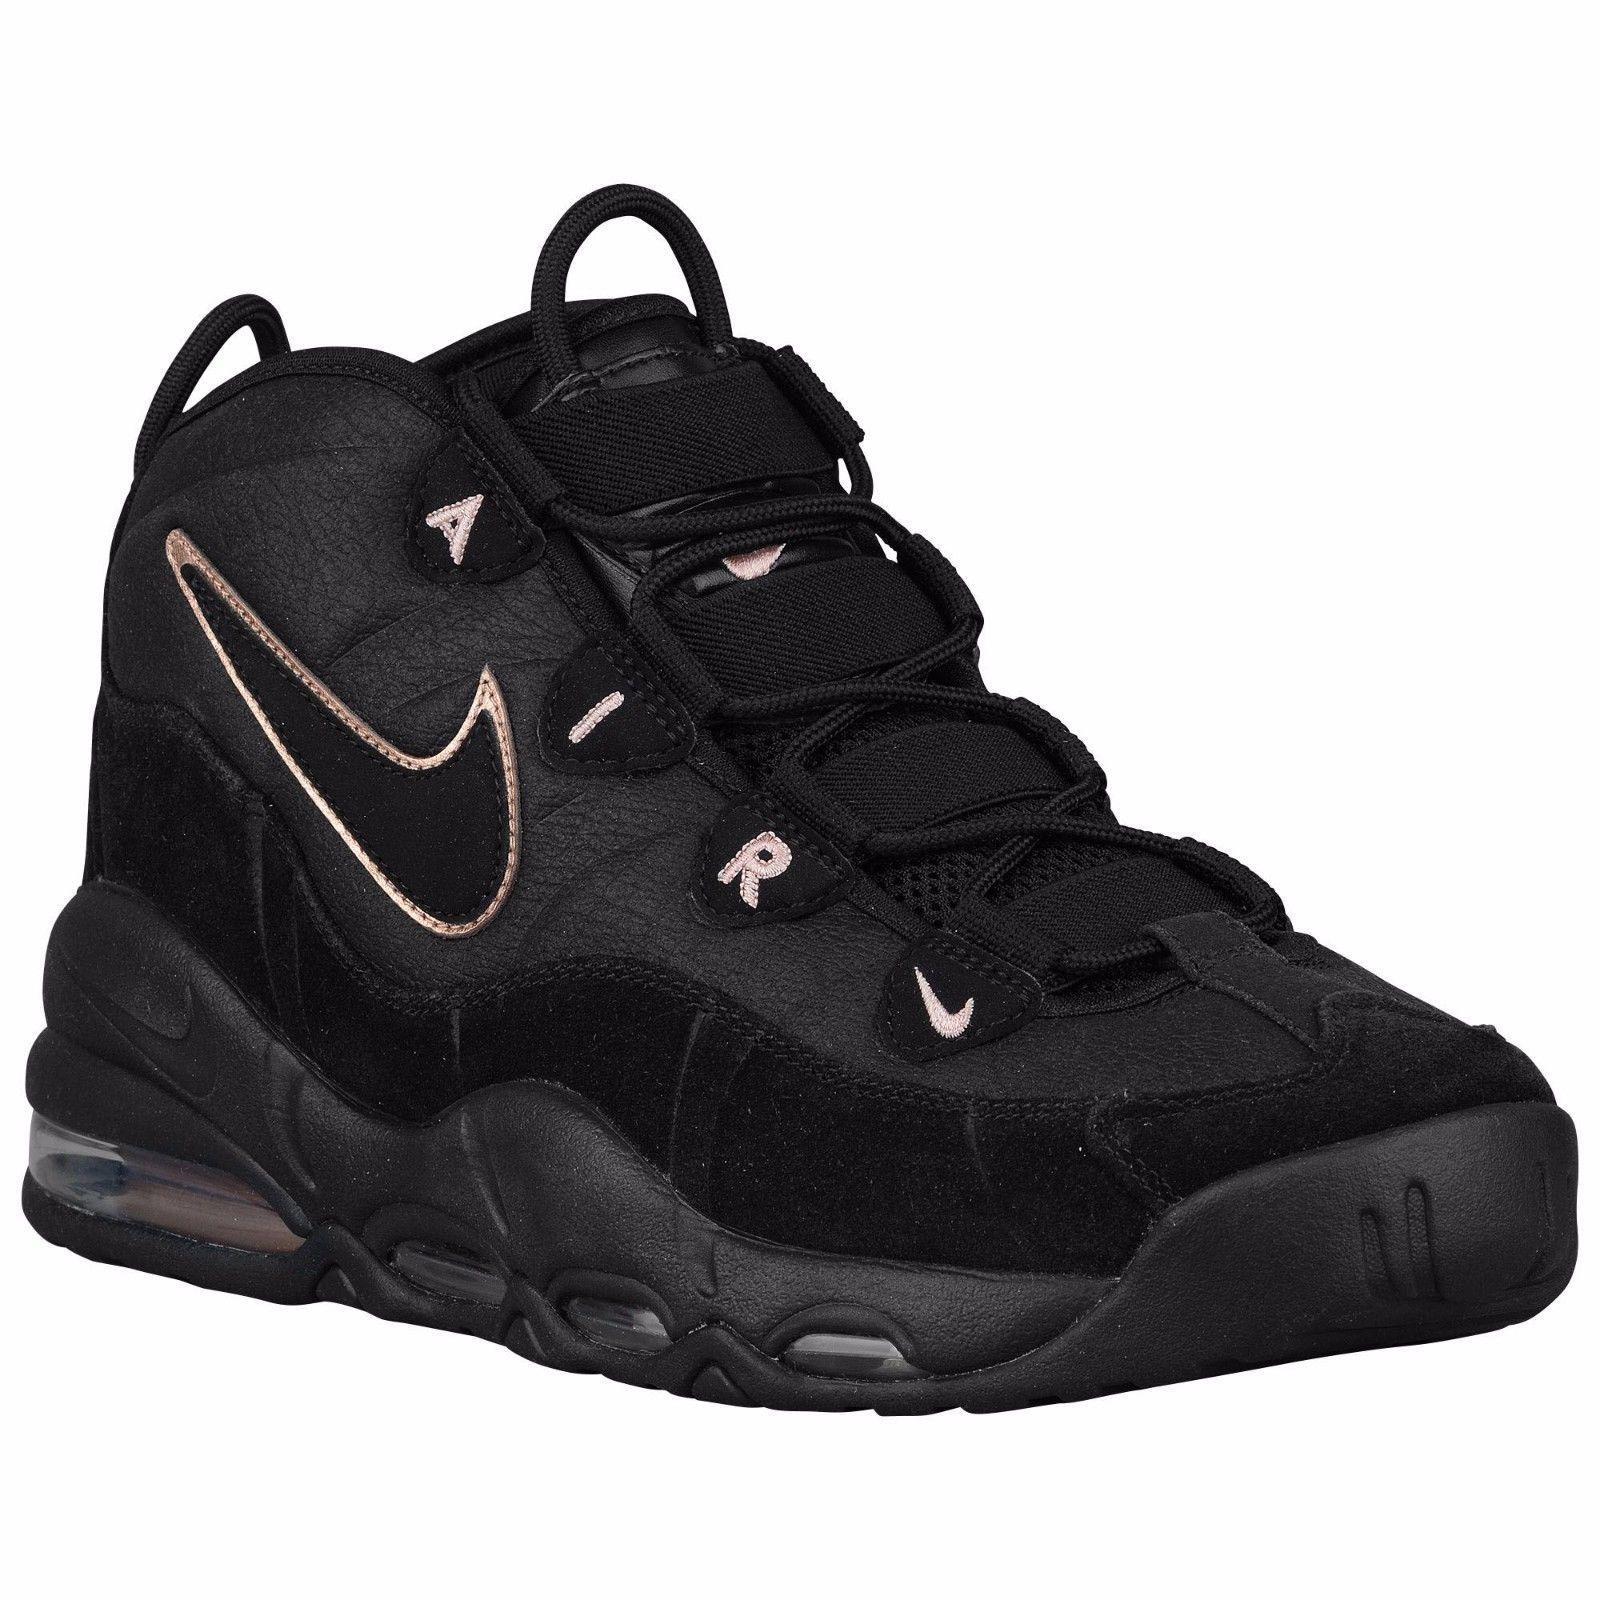 Nike Tennis Shoes Under  Dollars